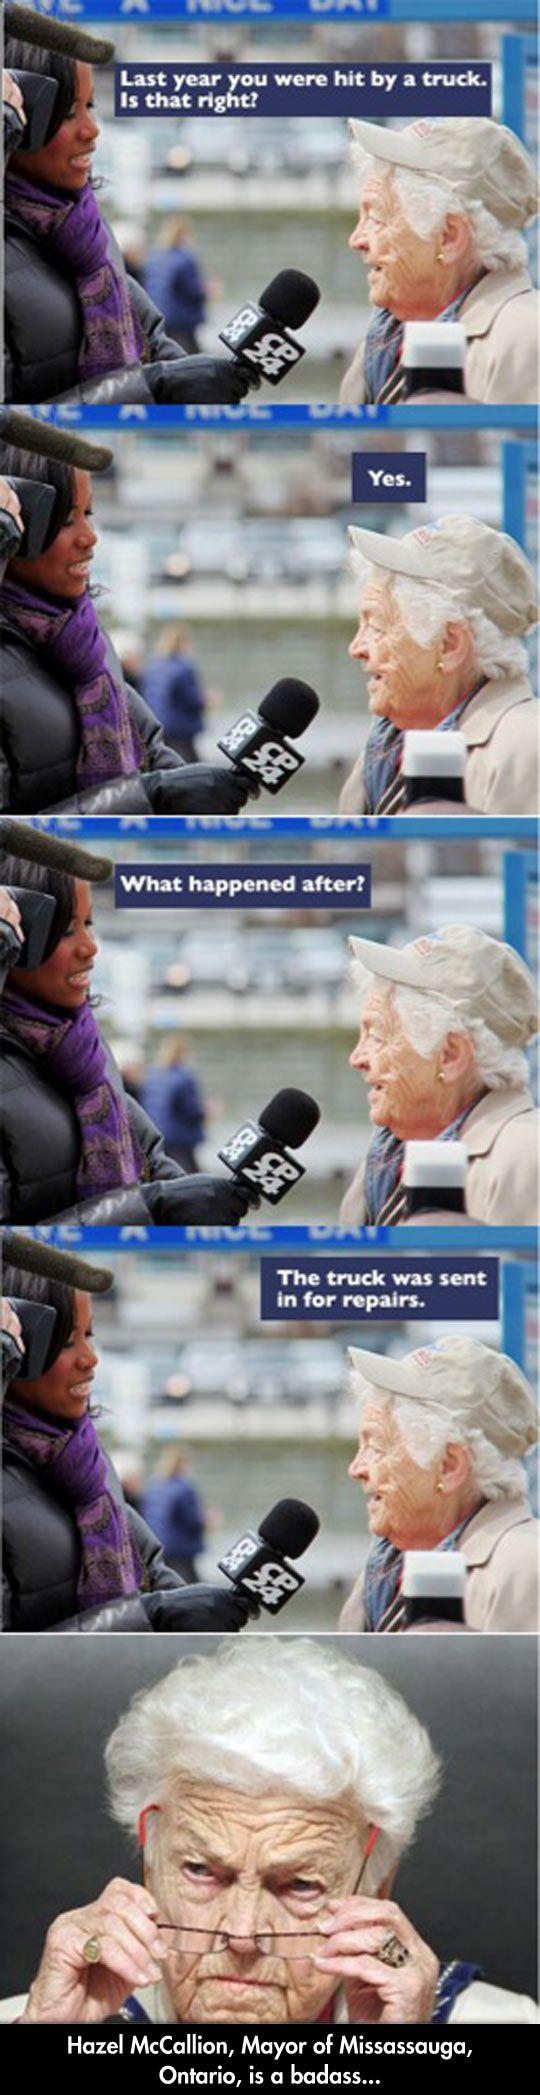 Chuck Norris' Grandma?!?!